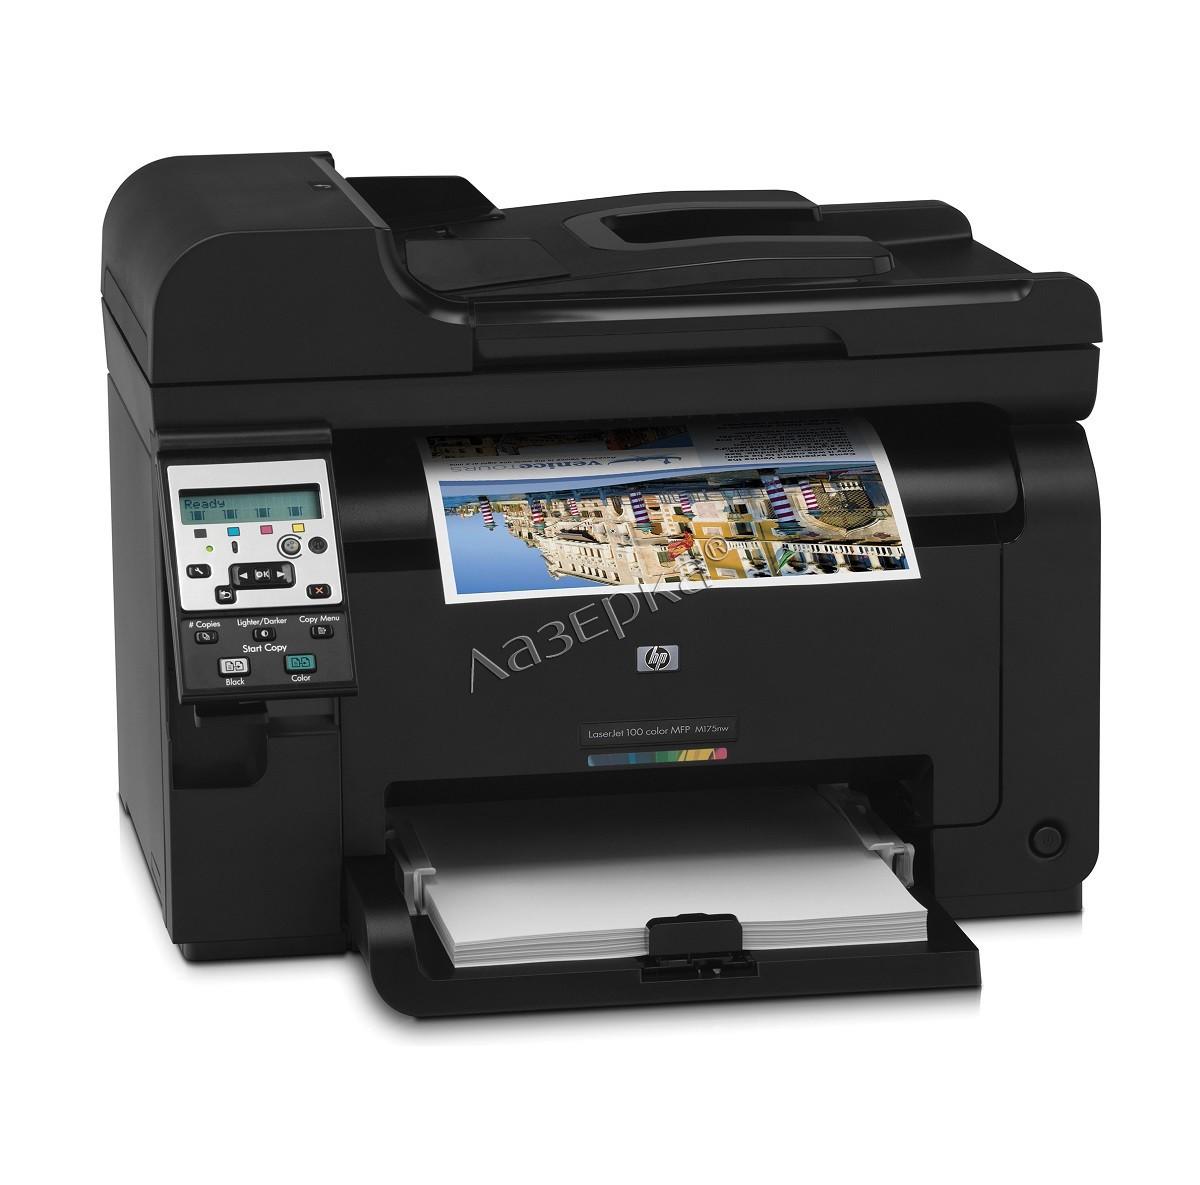 Картриджи для HP LaserJet Pro 100 Color mfp M175a